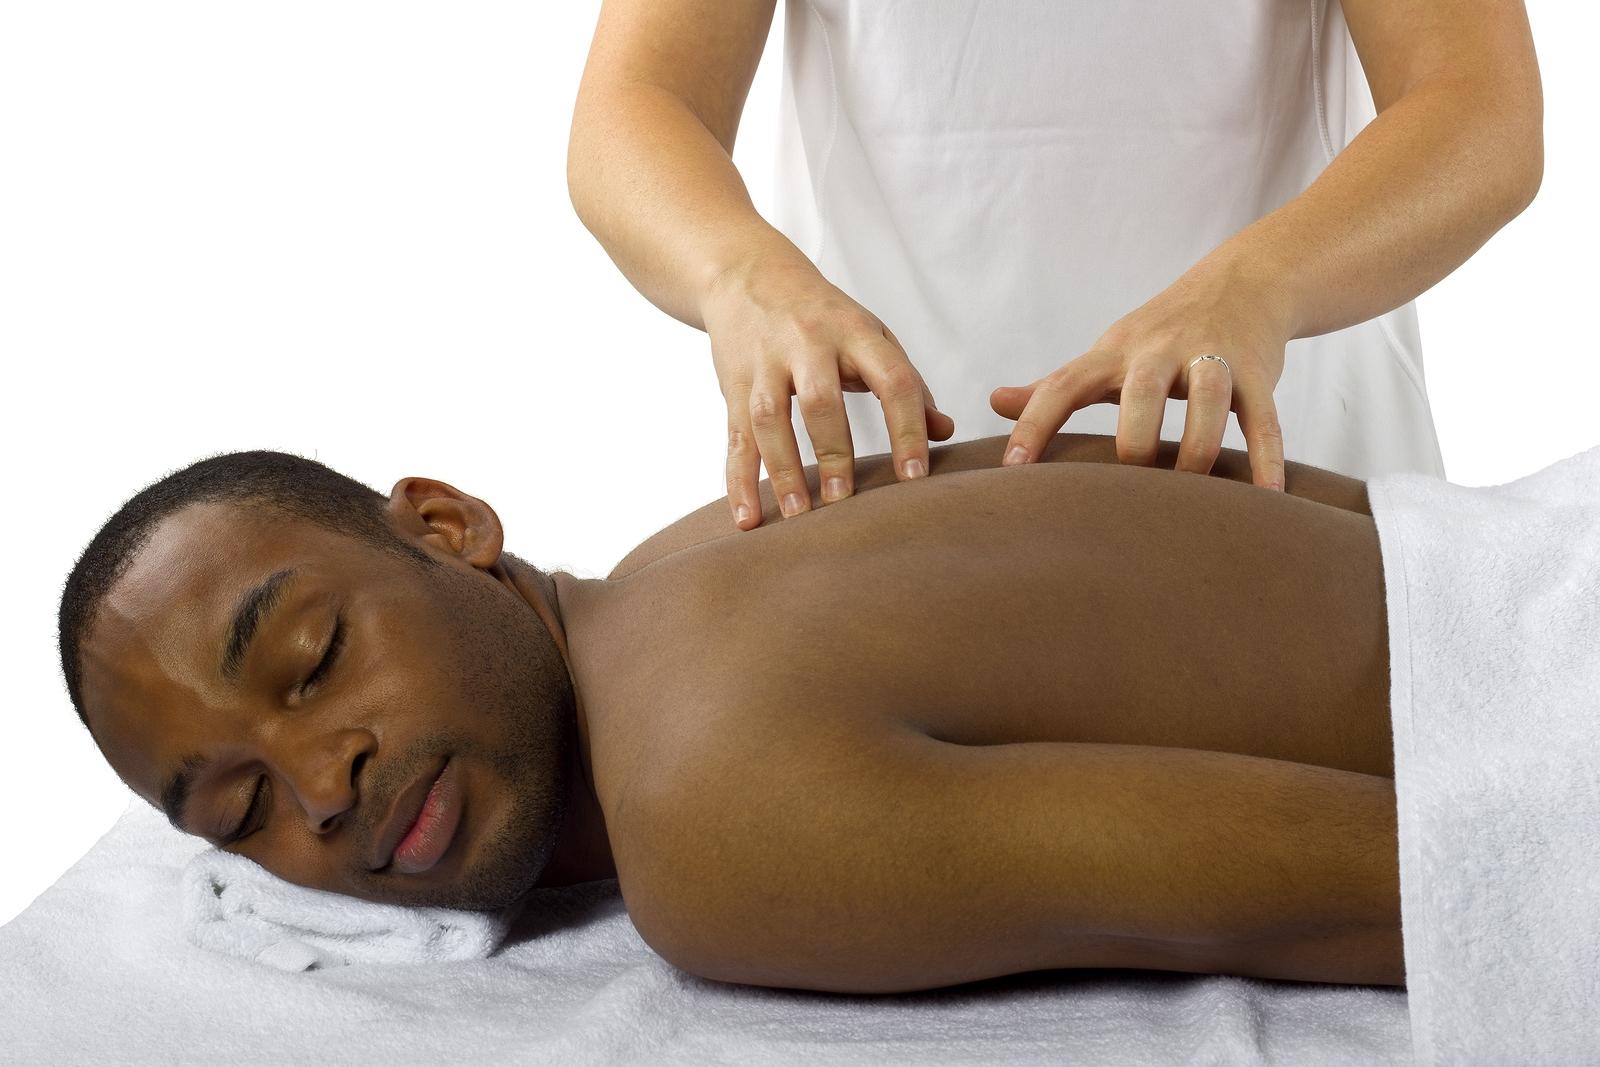 bigstock-Massage--Physical-Therapy-53182864.jpg